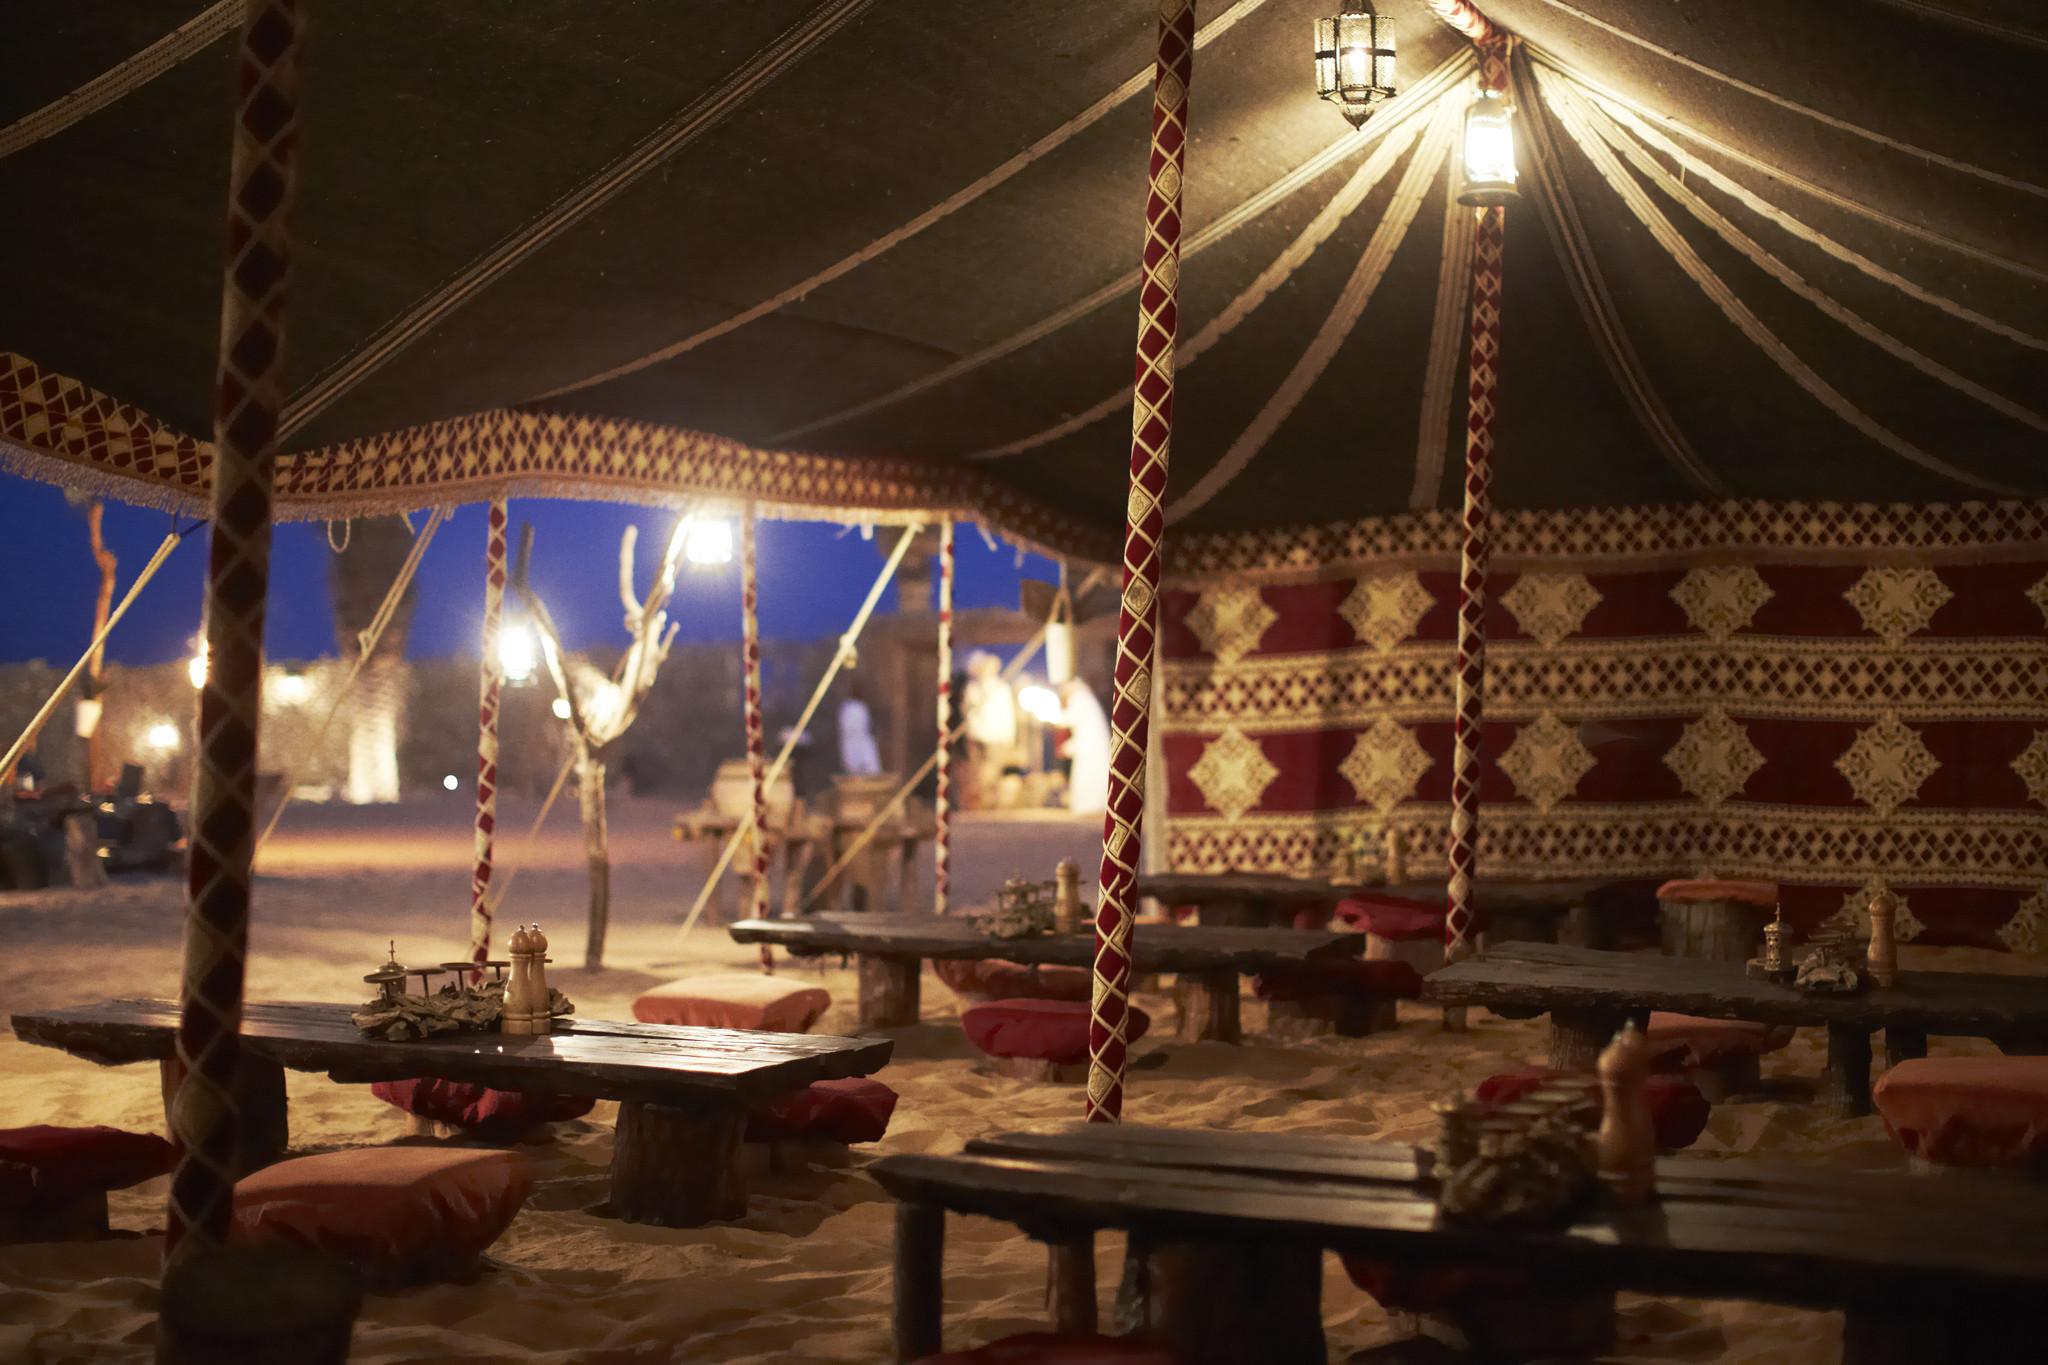 Dubai Ovenight Tour Includes Breakfast With A Bedouin